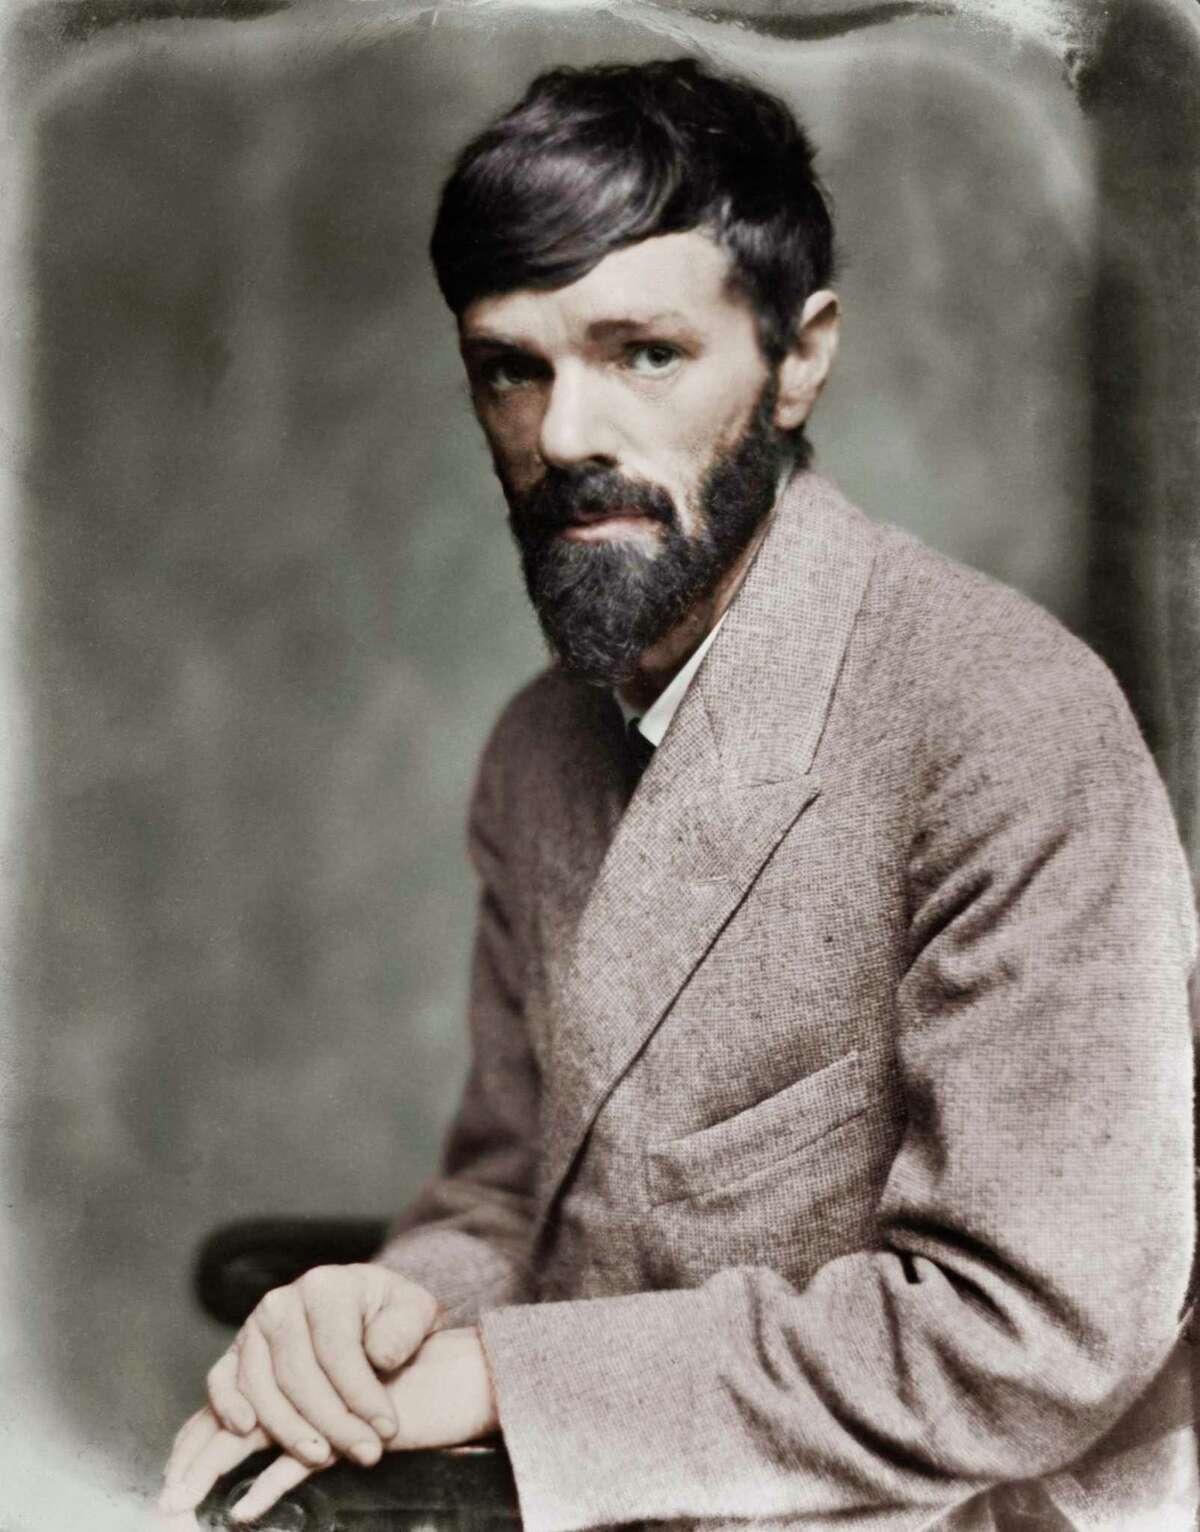 D.H. Lawrence, circa 1900 (1885-1930).